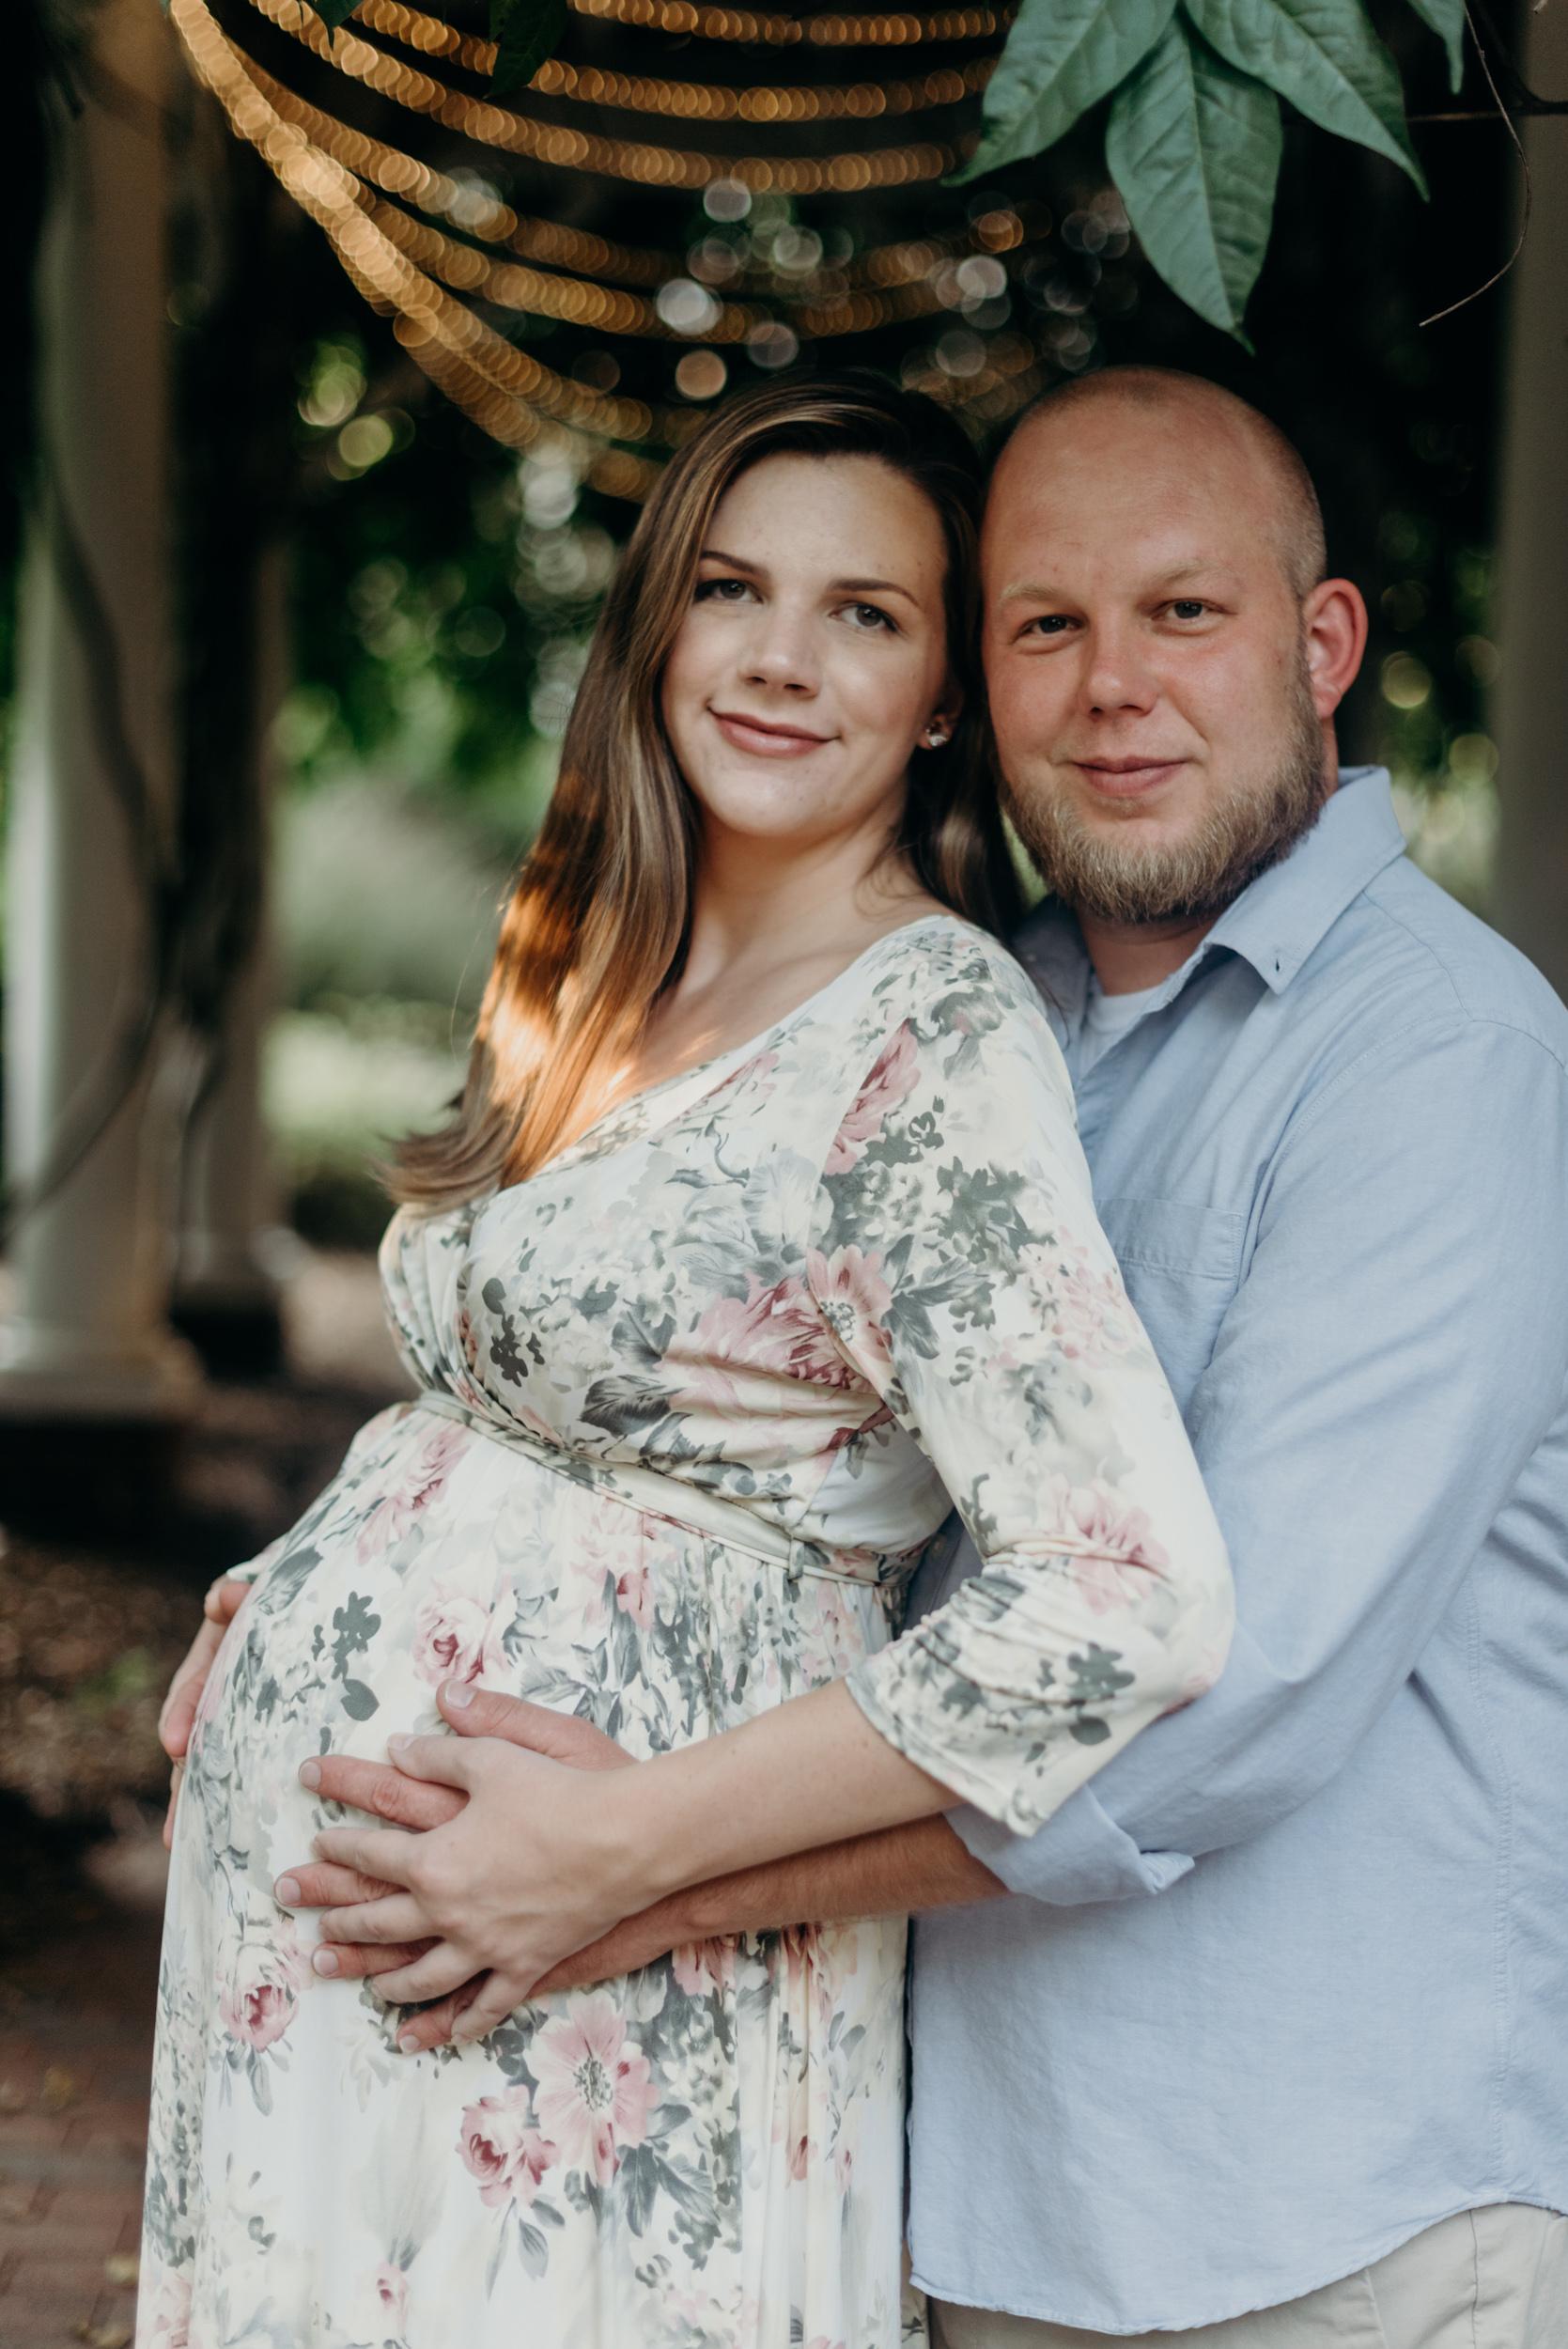 winston-salem-NC-maternity-family-photographer-old-salem-megan-graham-photography-2900.jpg